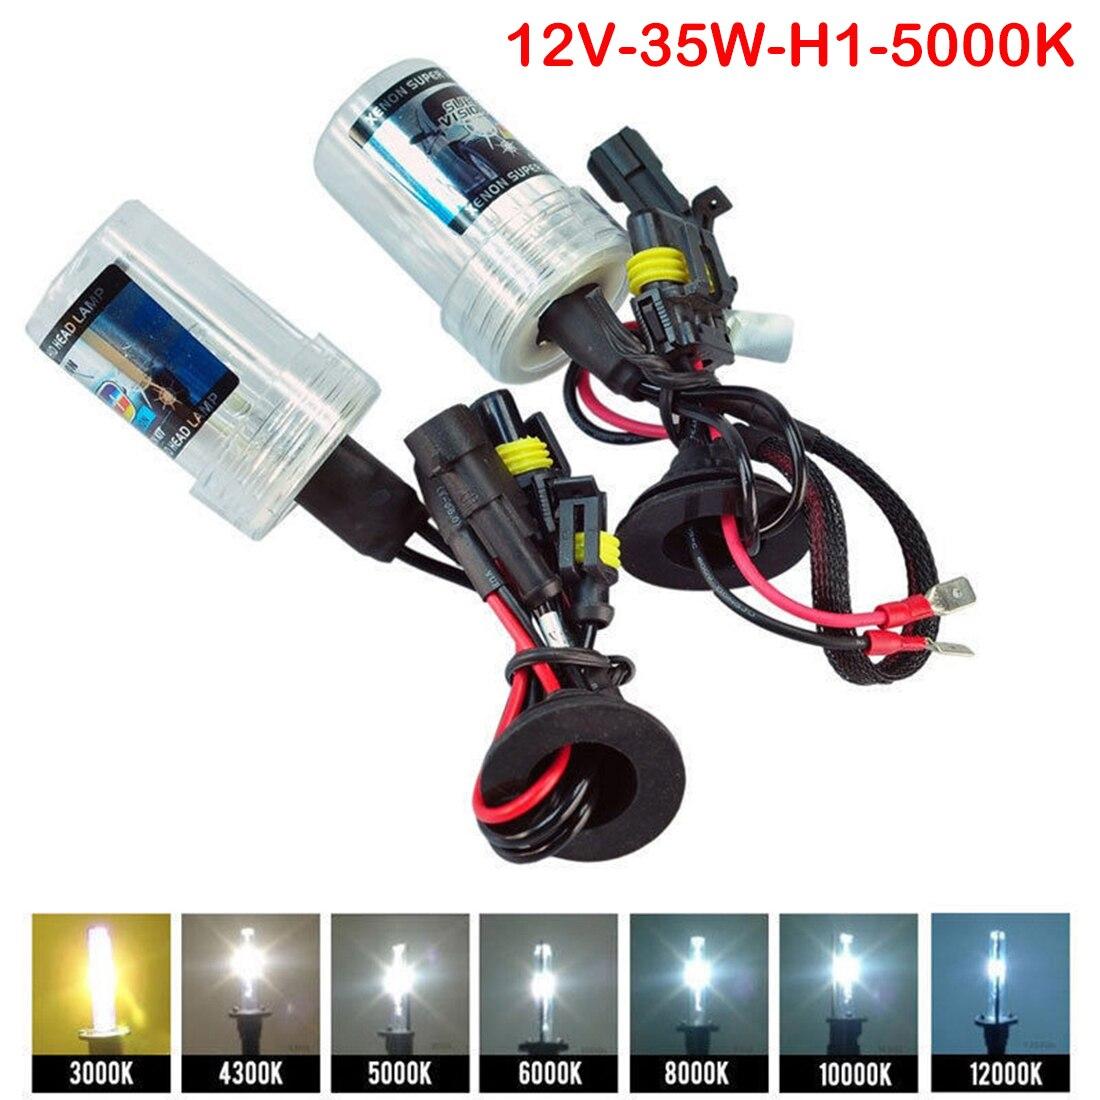 FangNymph H1 H3 H7 H11 9005 9006 880 35W 55W HID Bulb Auto Car Headlight Lamp 3000k 4300k 5000k 6000k 8000k 10000k 12000k